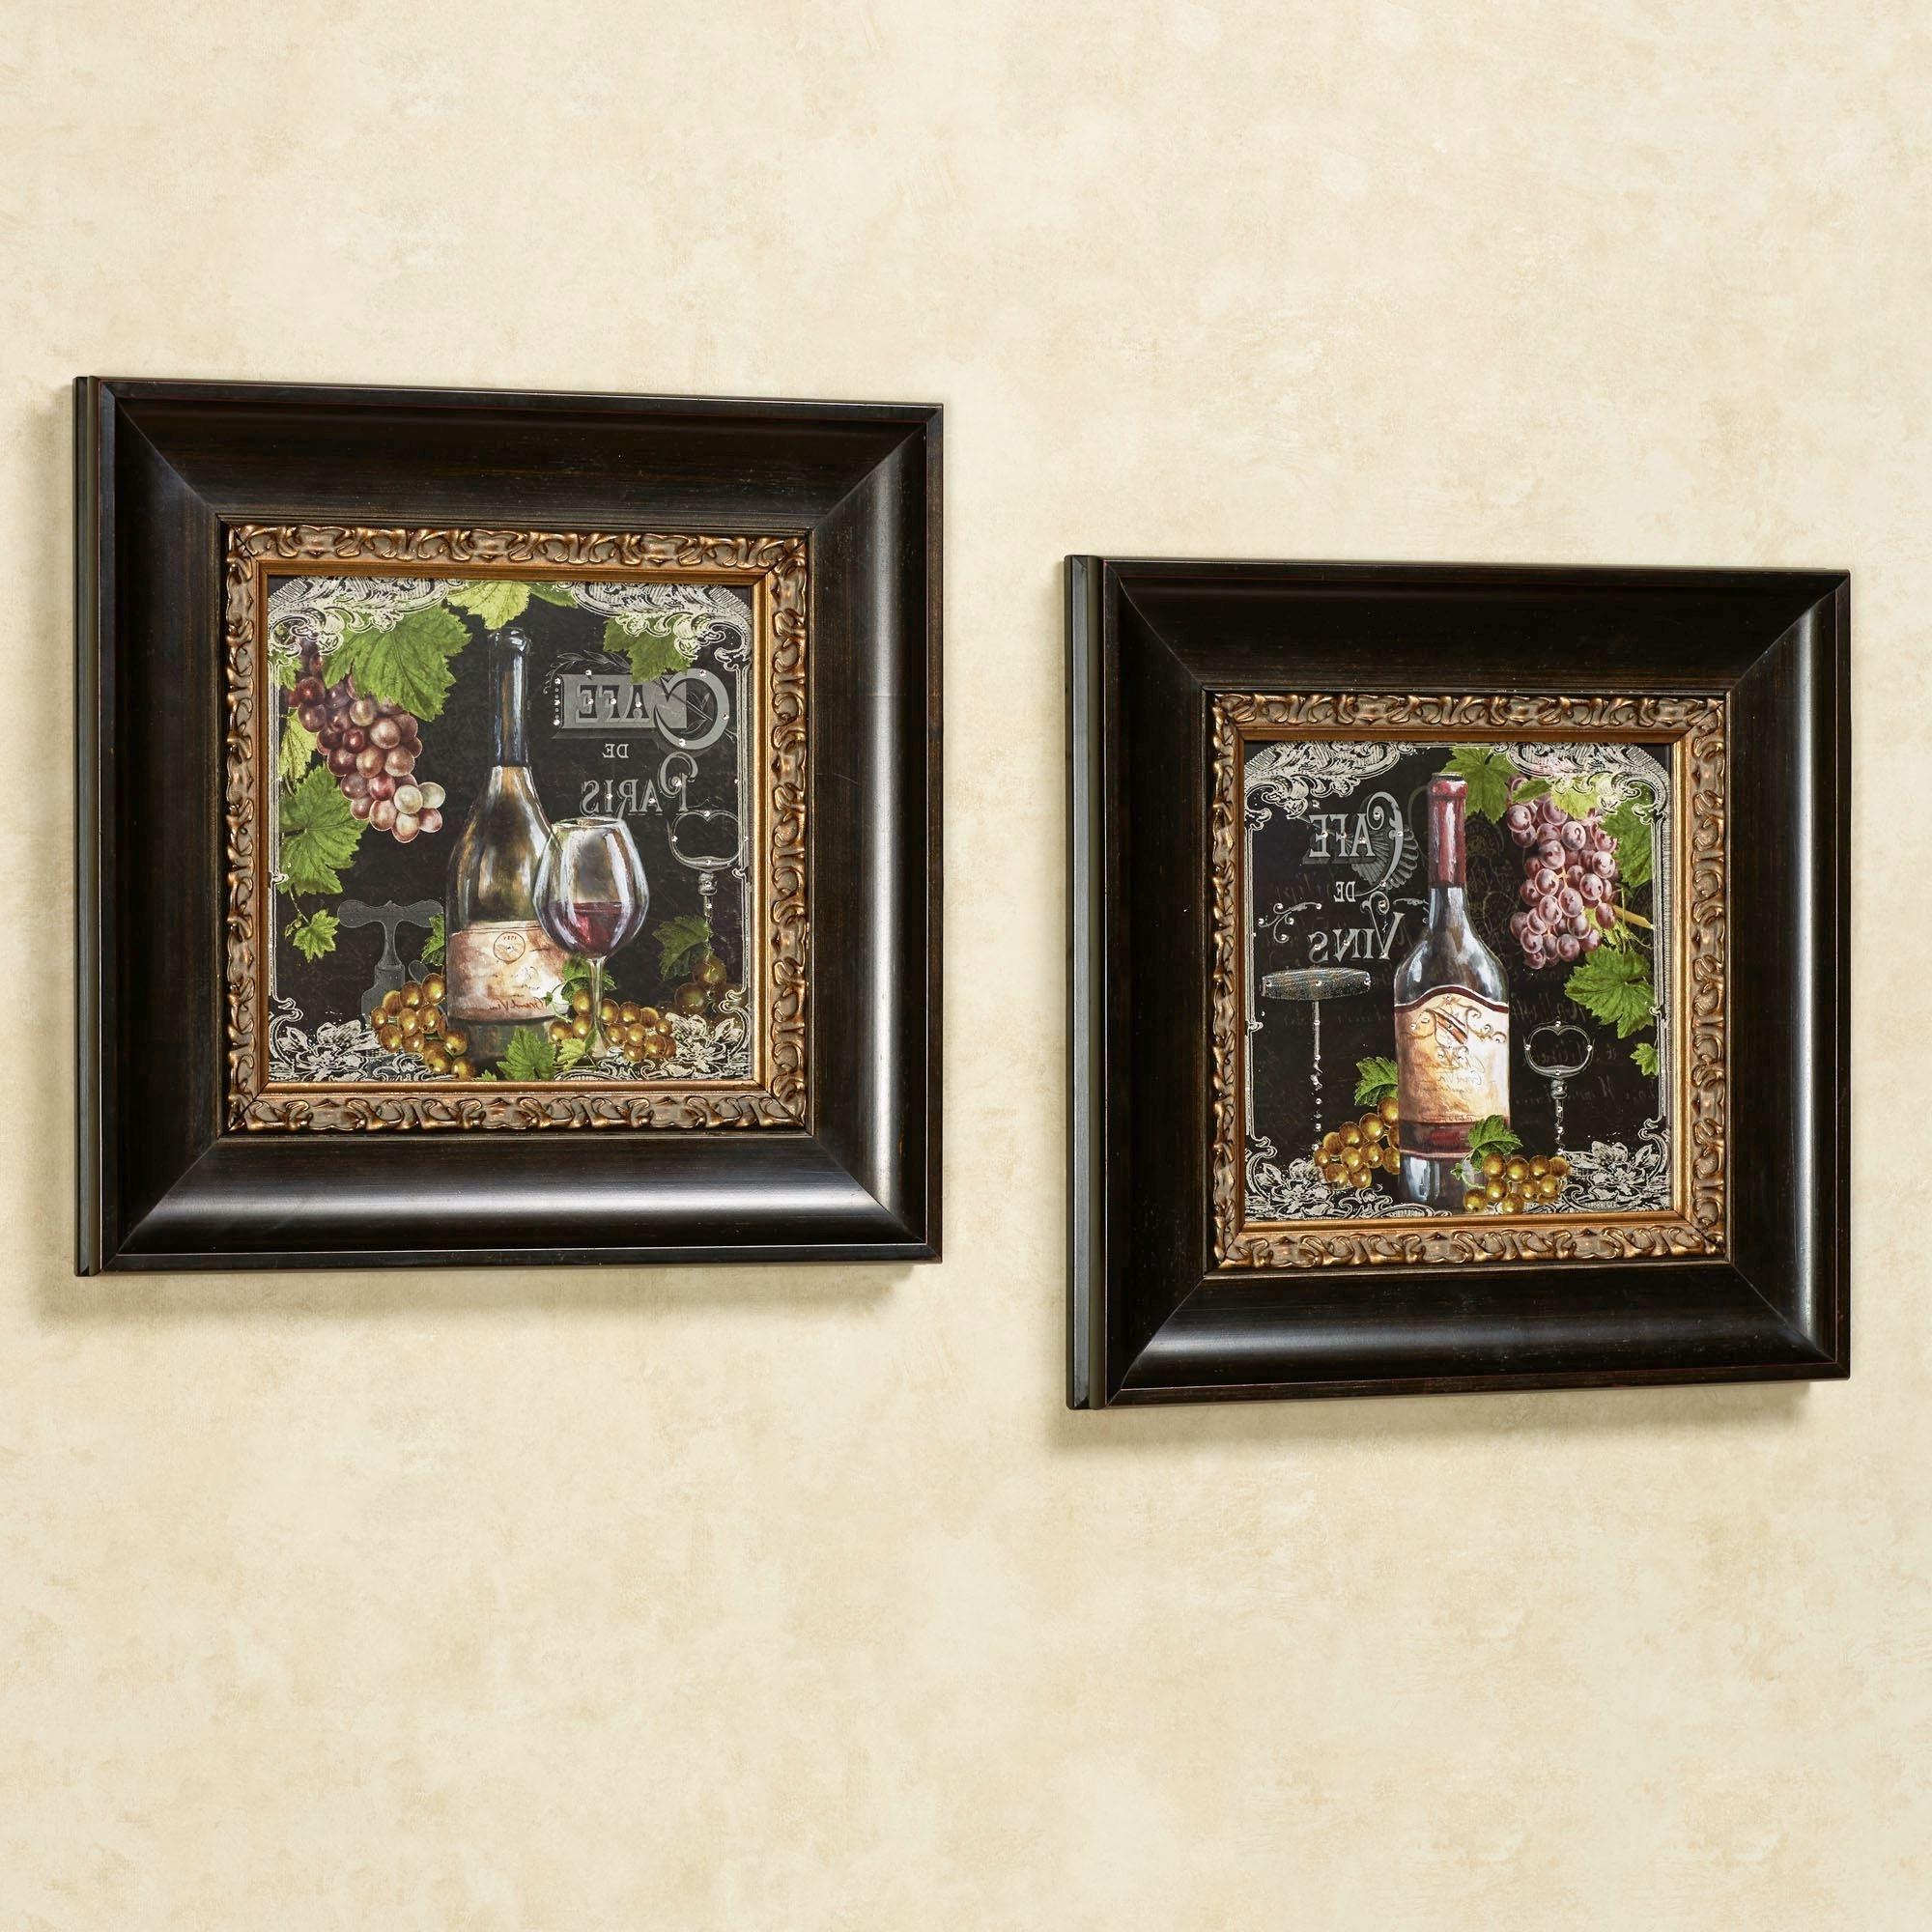 Christian Framed Art Prints Regarding Most Popular Art (View 2 of 15)